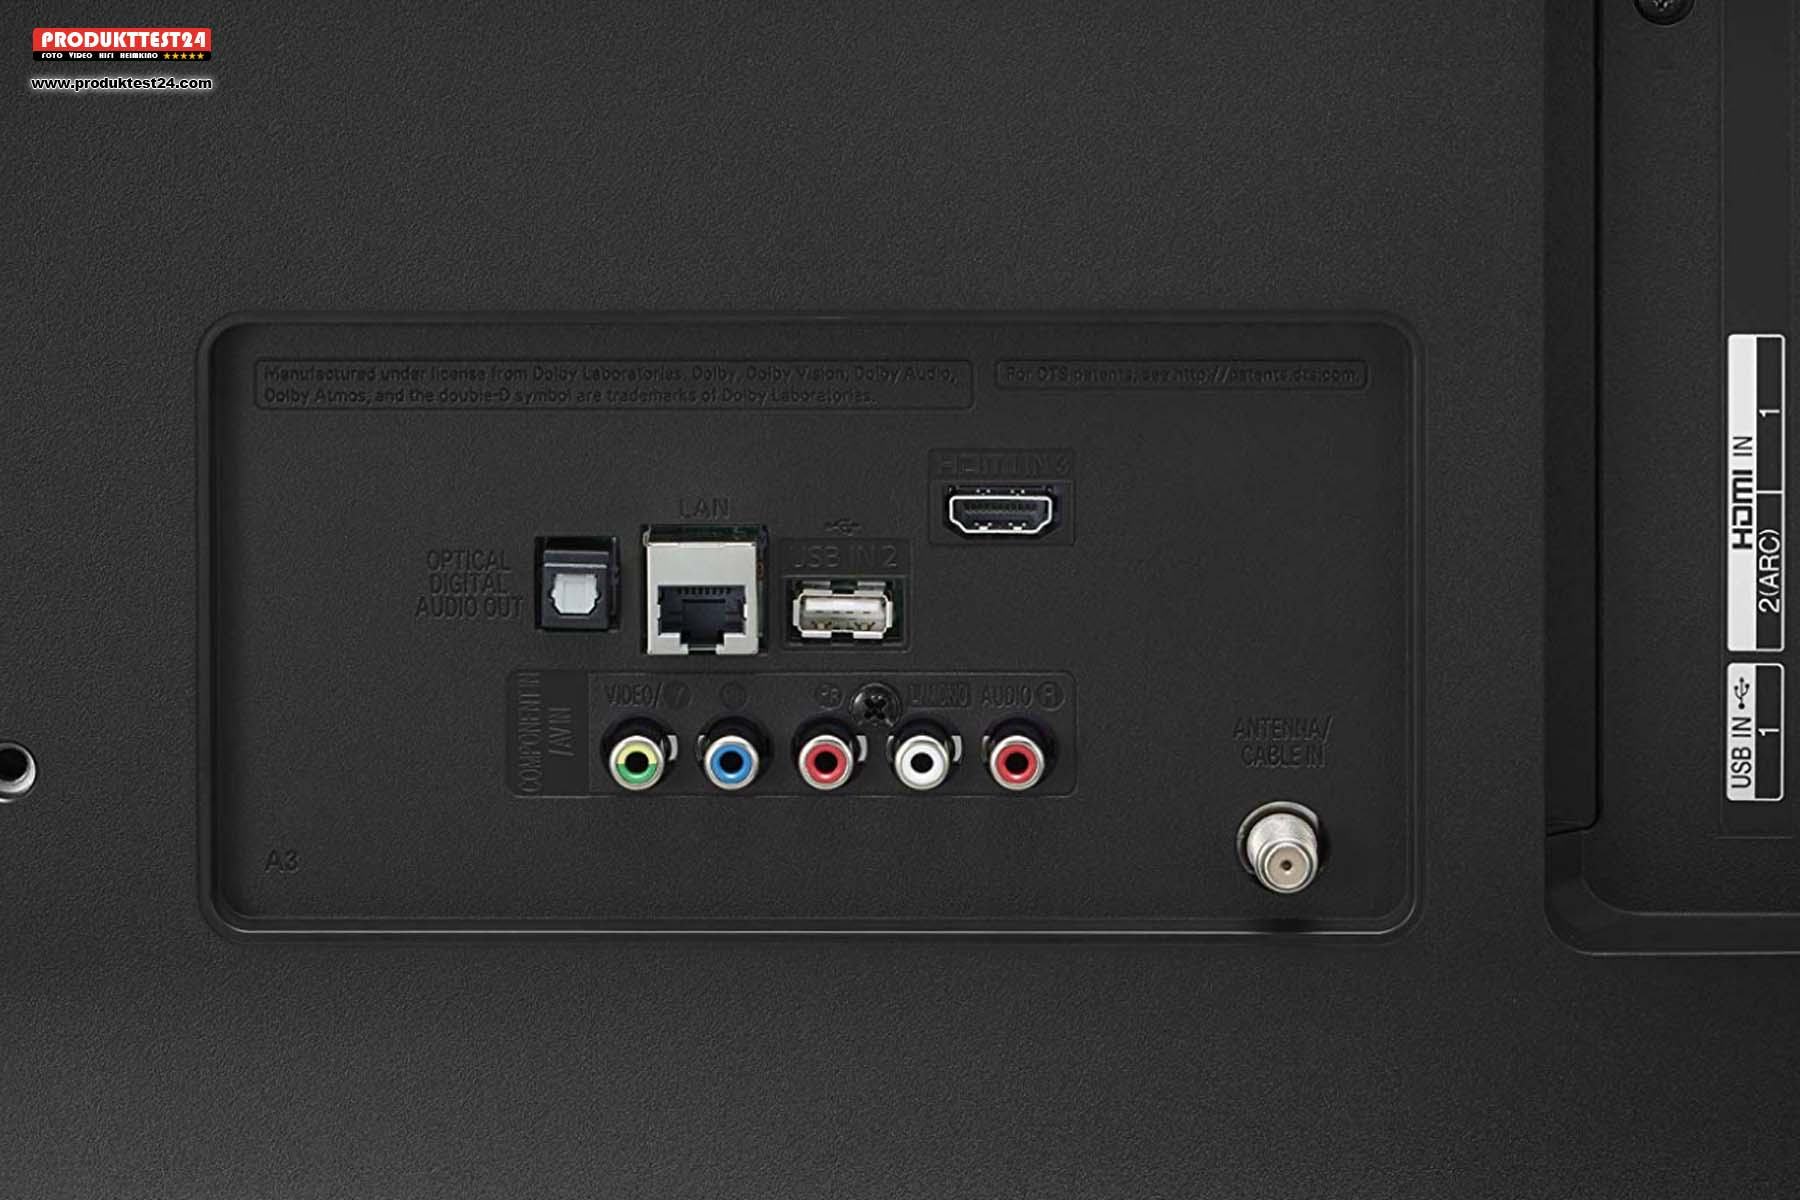 3x HDMI (Ver 2.2), 2x USB, 1x Optisch, 1x Analog AV, 1x LAN, 1x WLAN